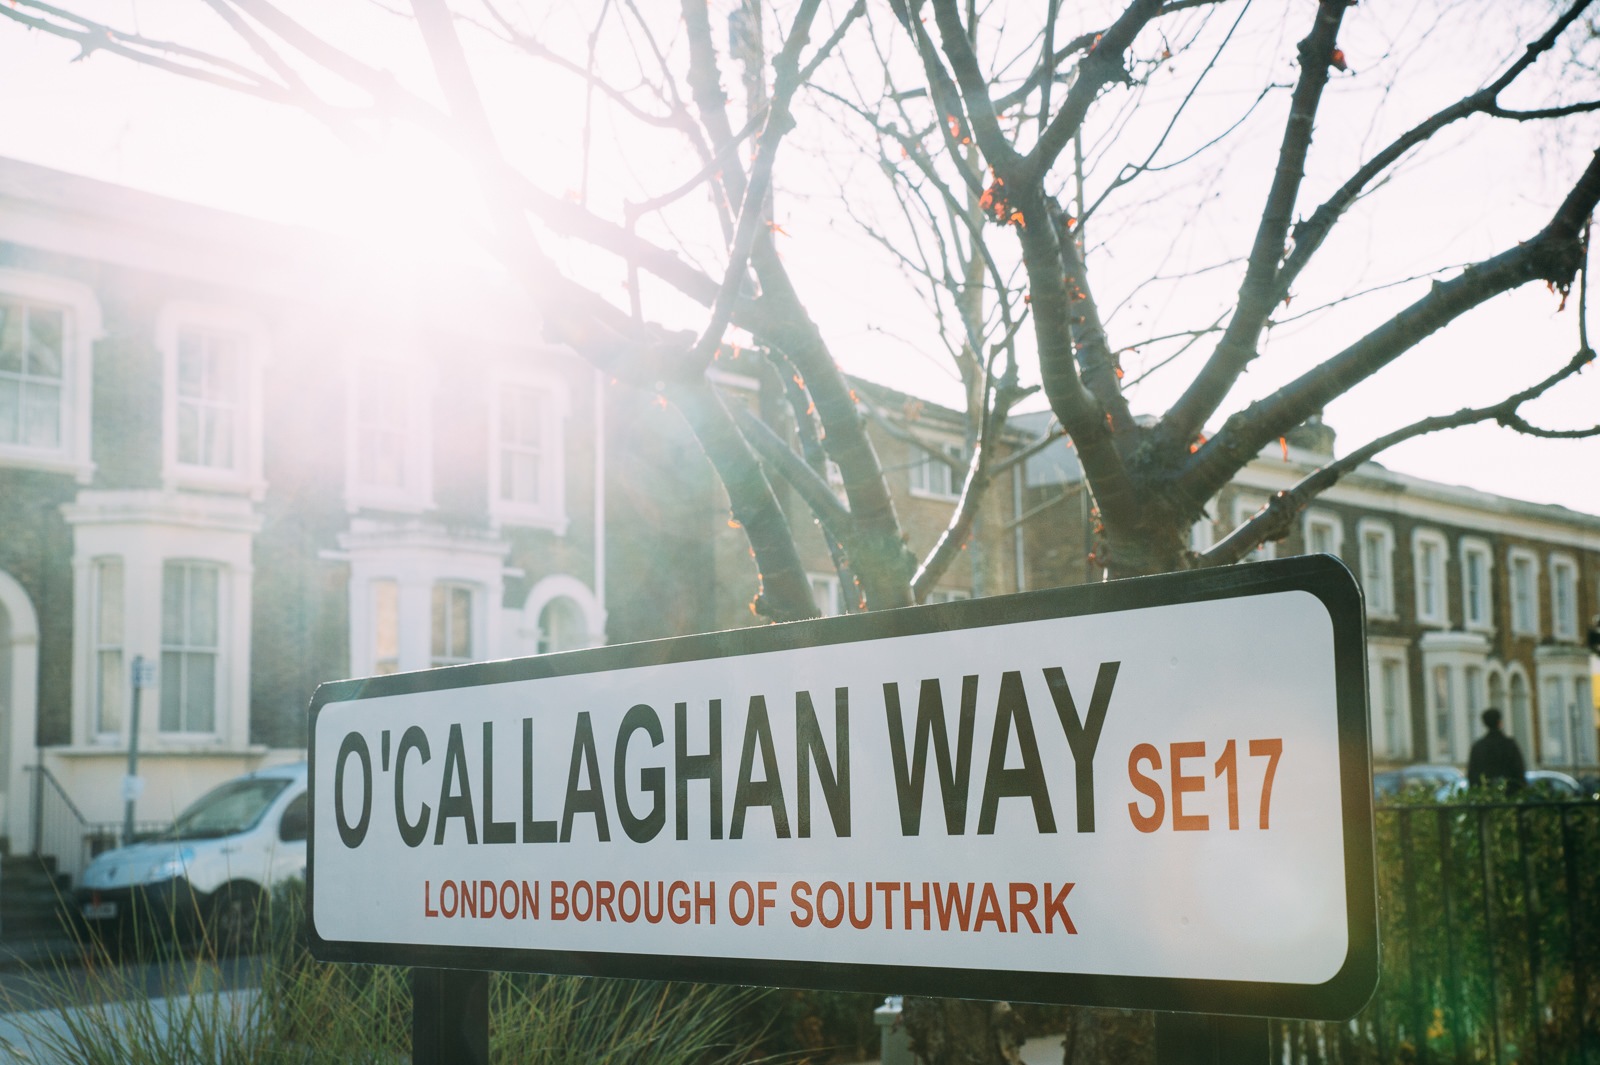 o'callaghan way se17 london